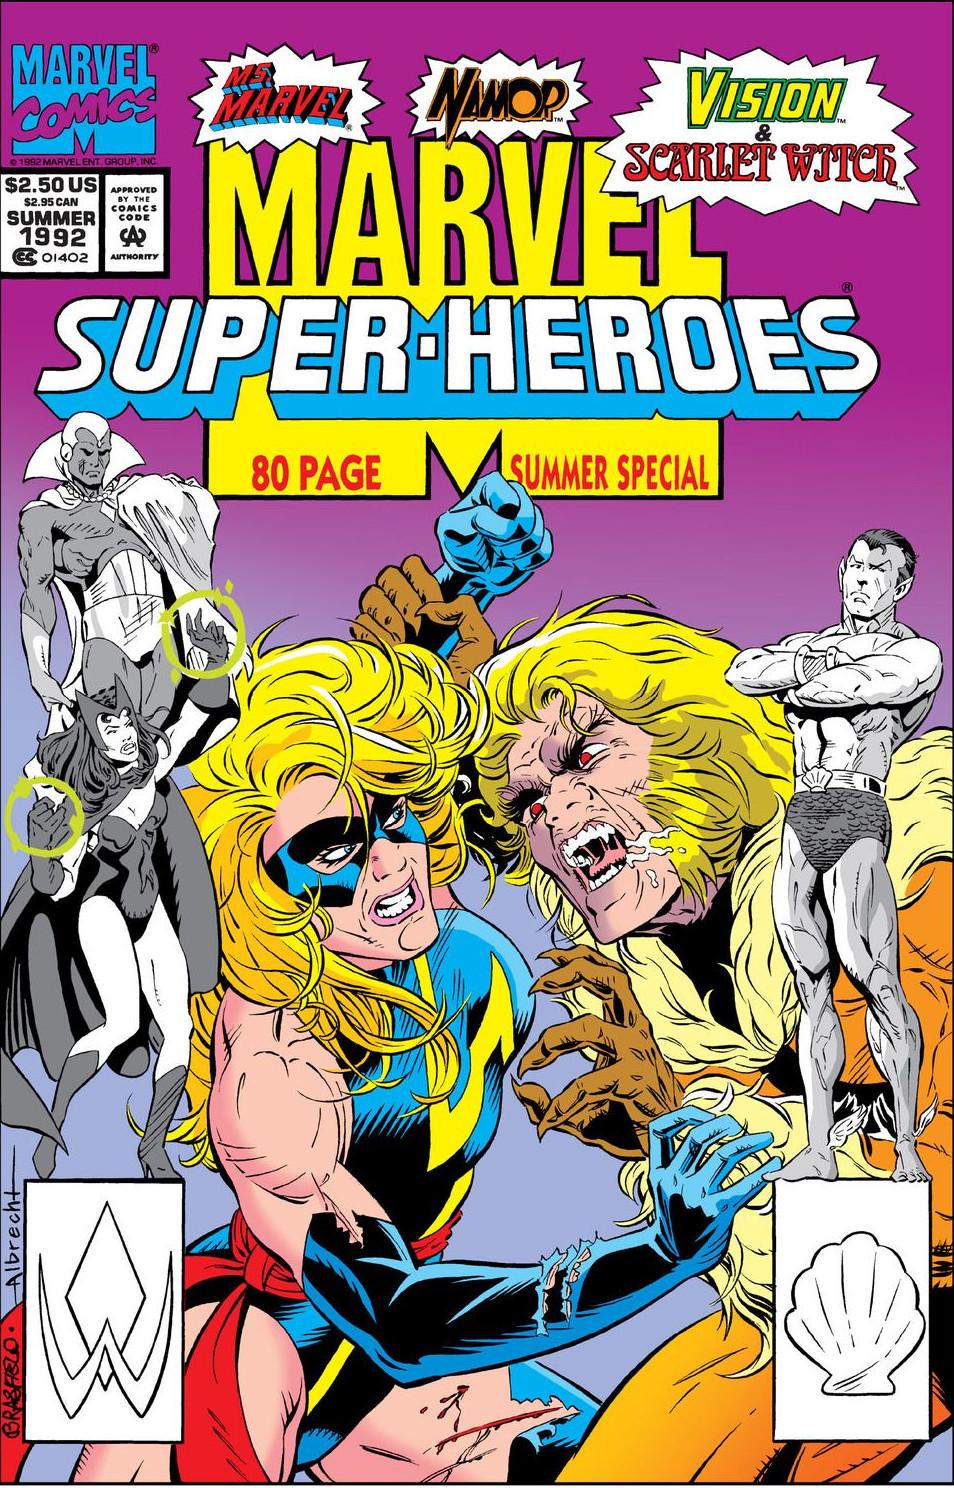 Marvel super heroes vol 2 marvel database fandom powered by wikia - Super heros fille marvel ...